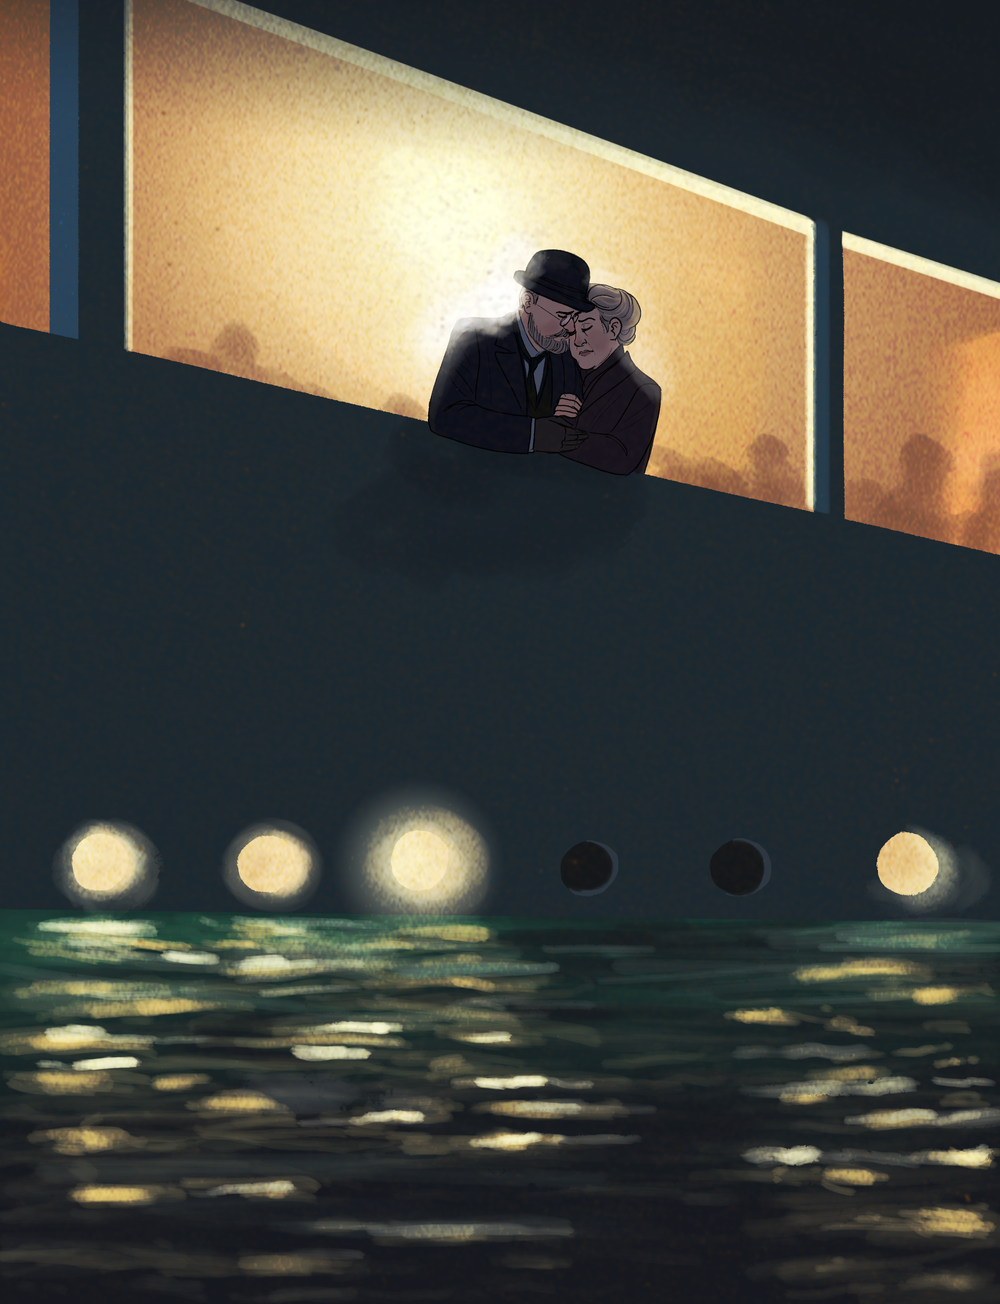 104th_titanic_anniversary_by_titanicgal1912-d9z9uv4.png